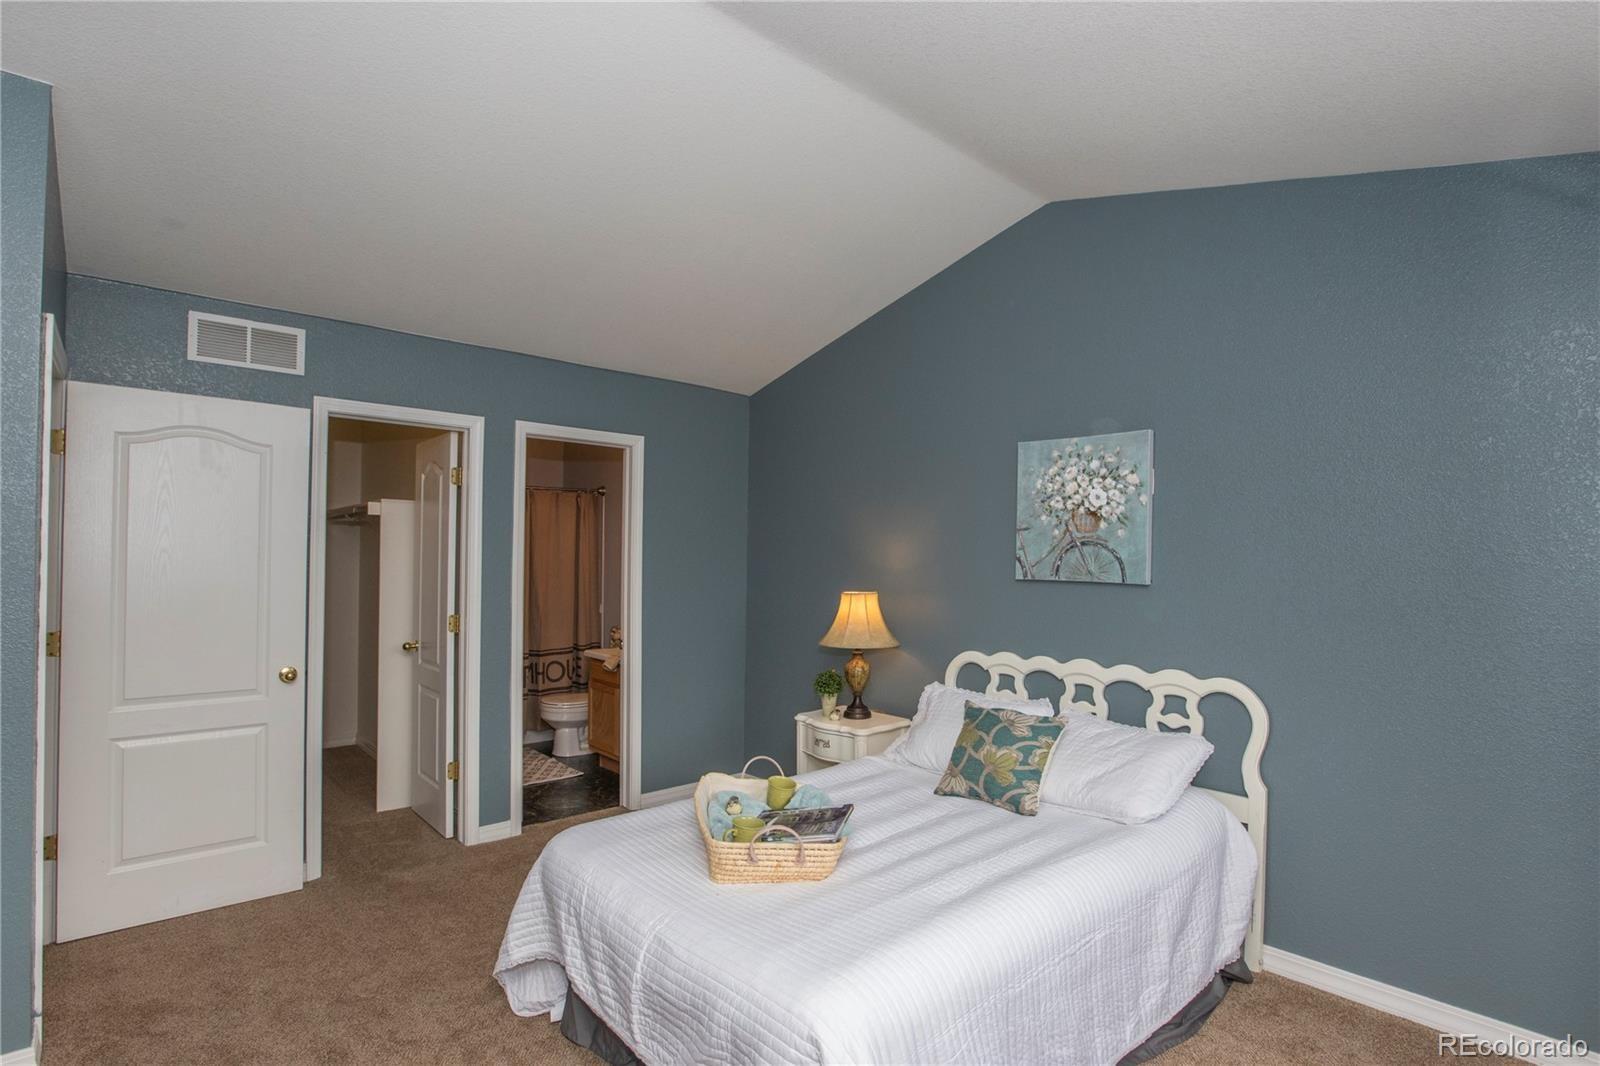 MLS# 3758449 - 19 - 6802 Antigua Drive #26, Fort Collins, CO 80525